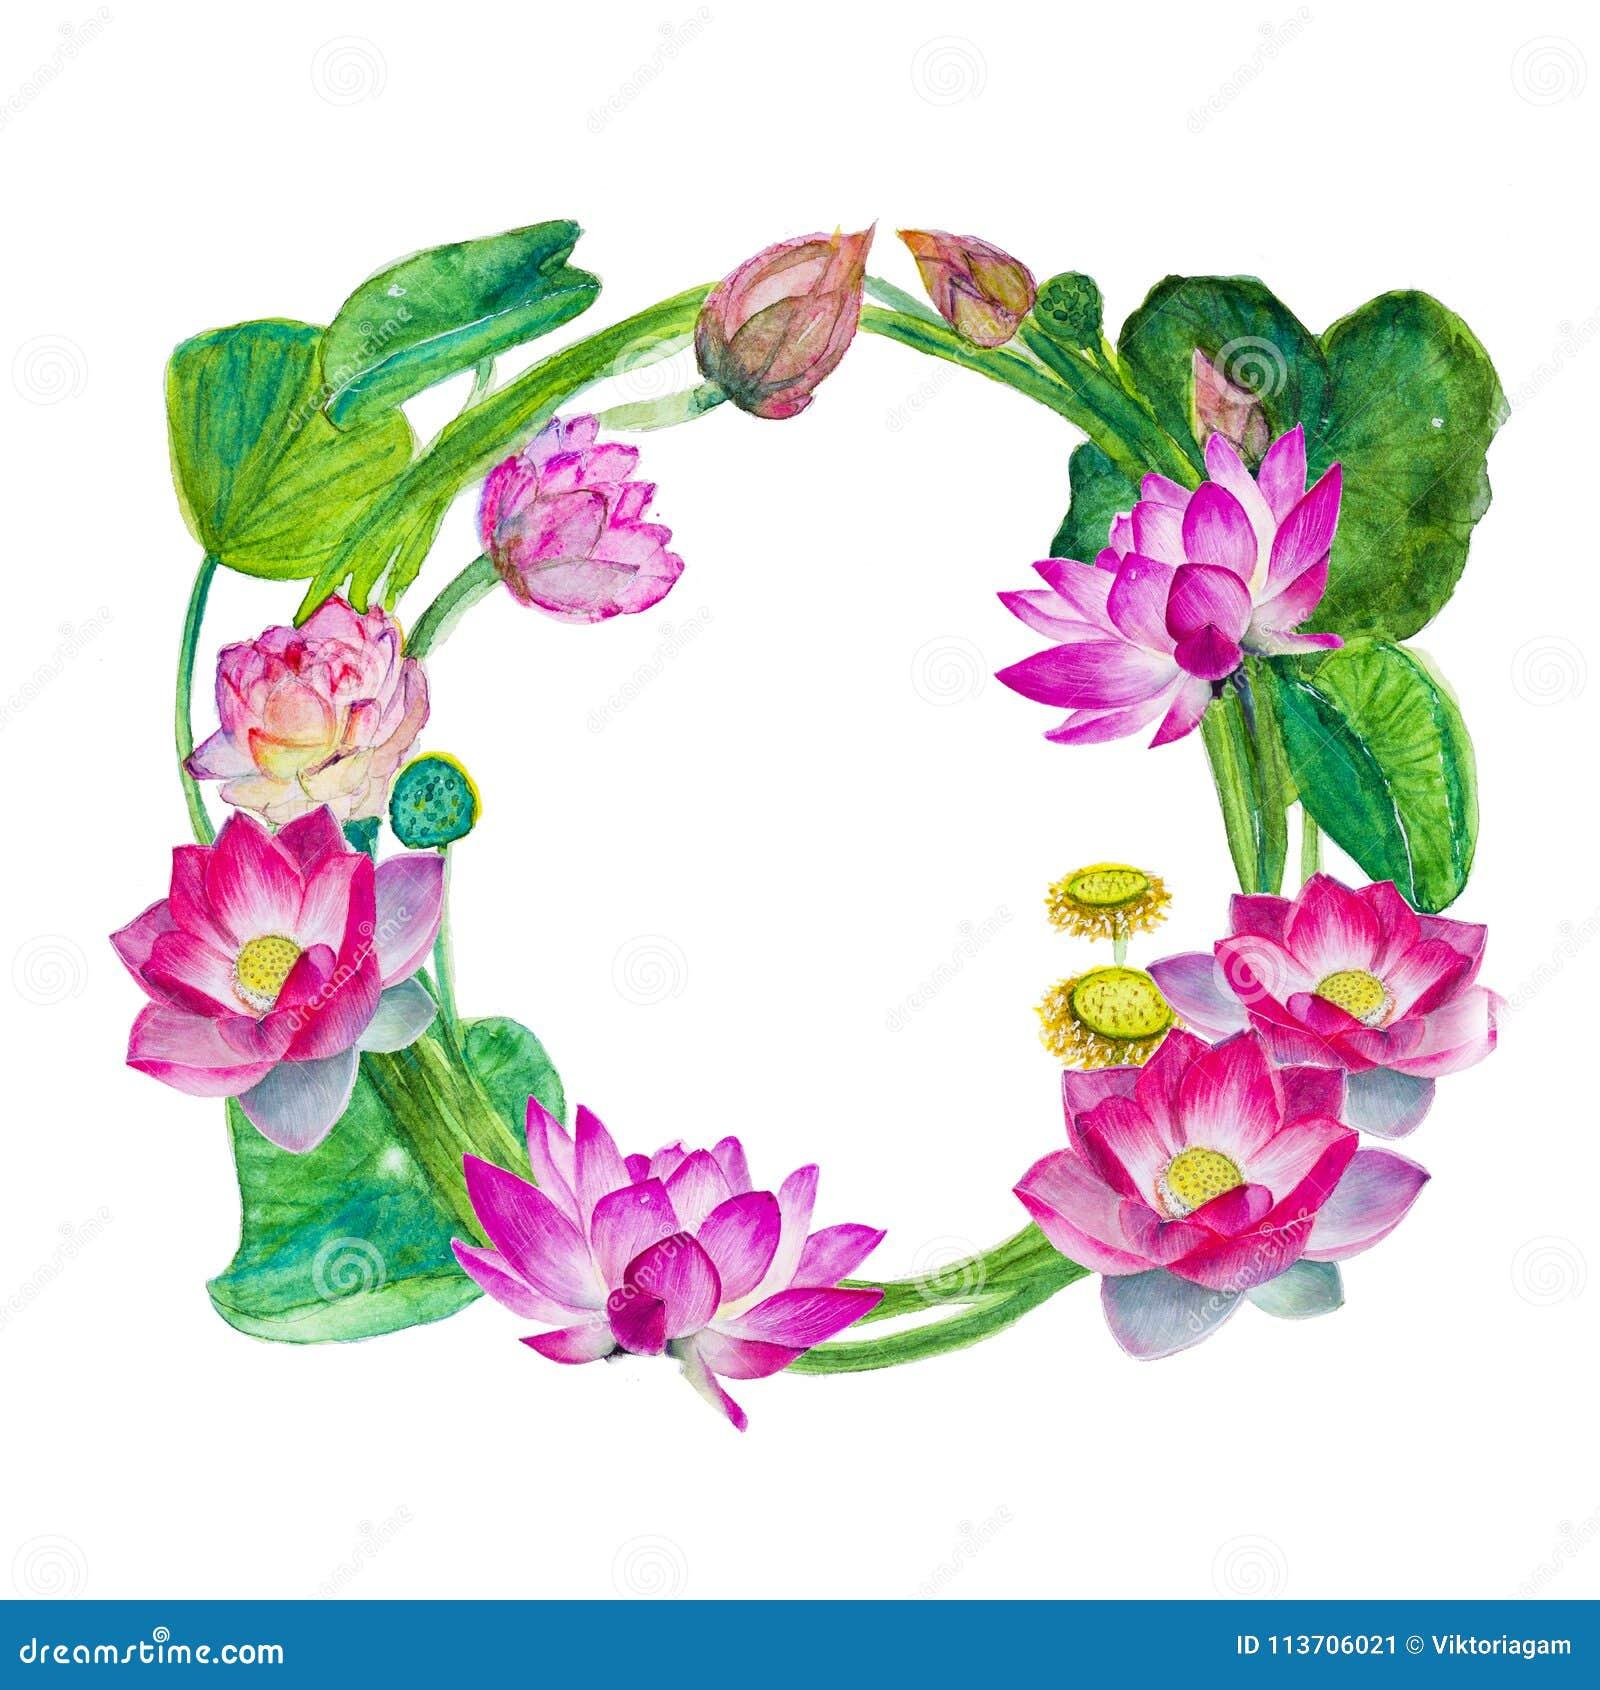 Wreath Of Flowers Leaves Buds And Lotus Flowers Watercolor Sk